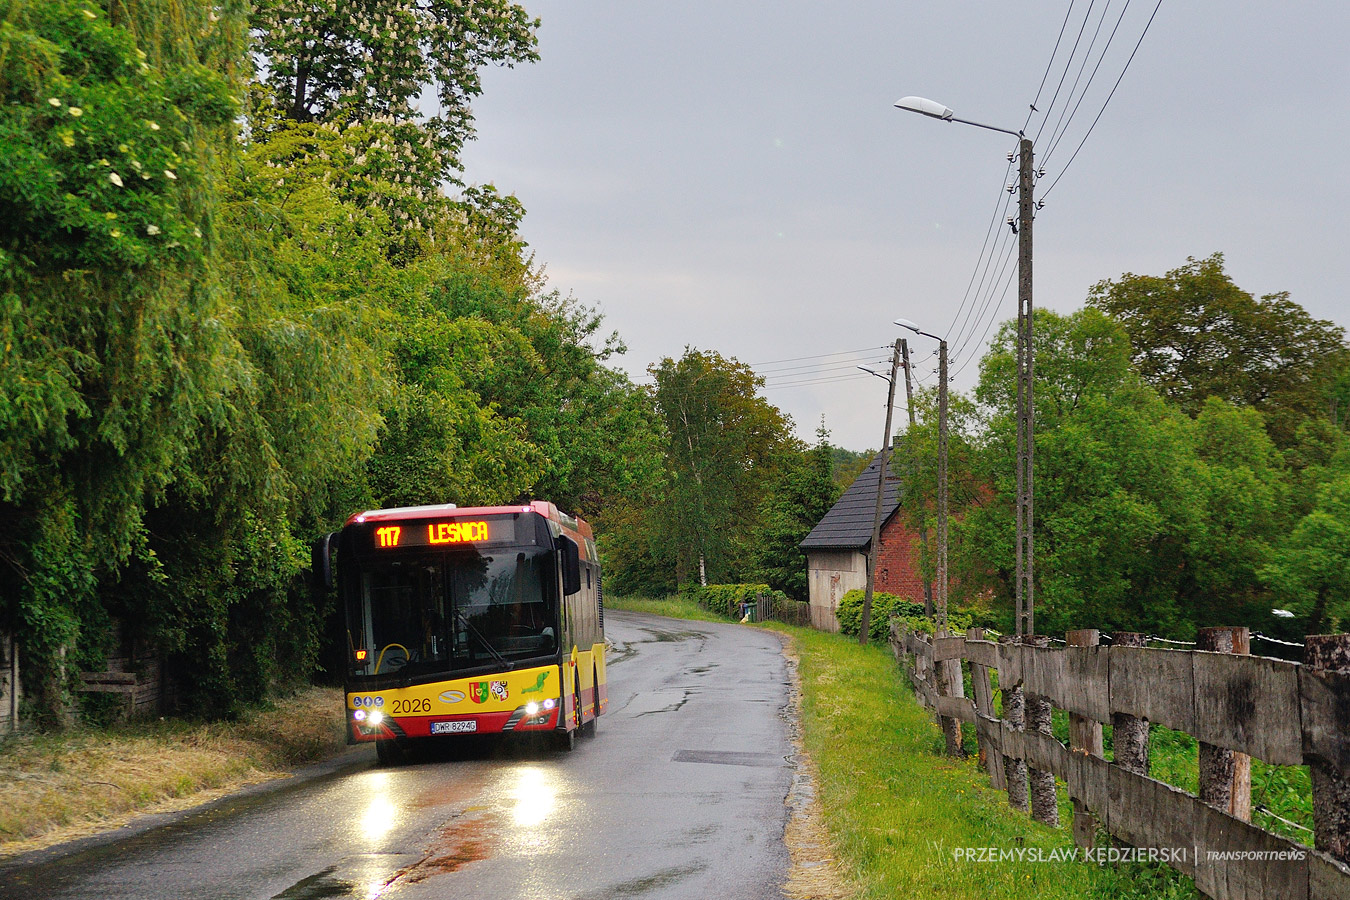 Solaris Urbino 10,5 IV #2026